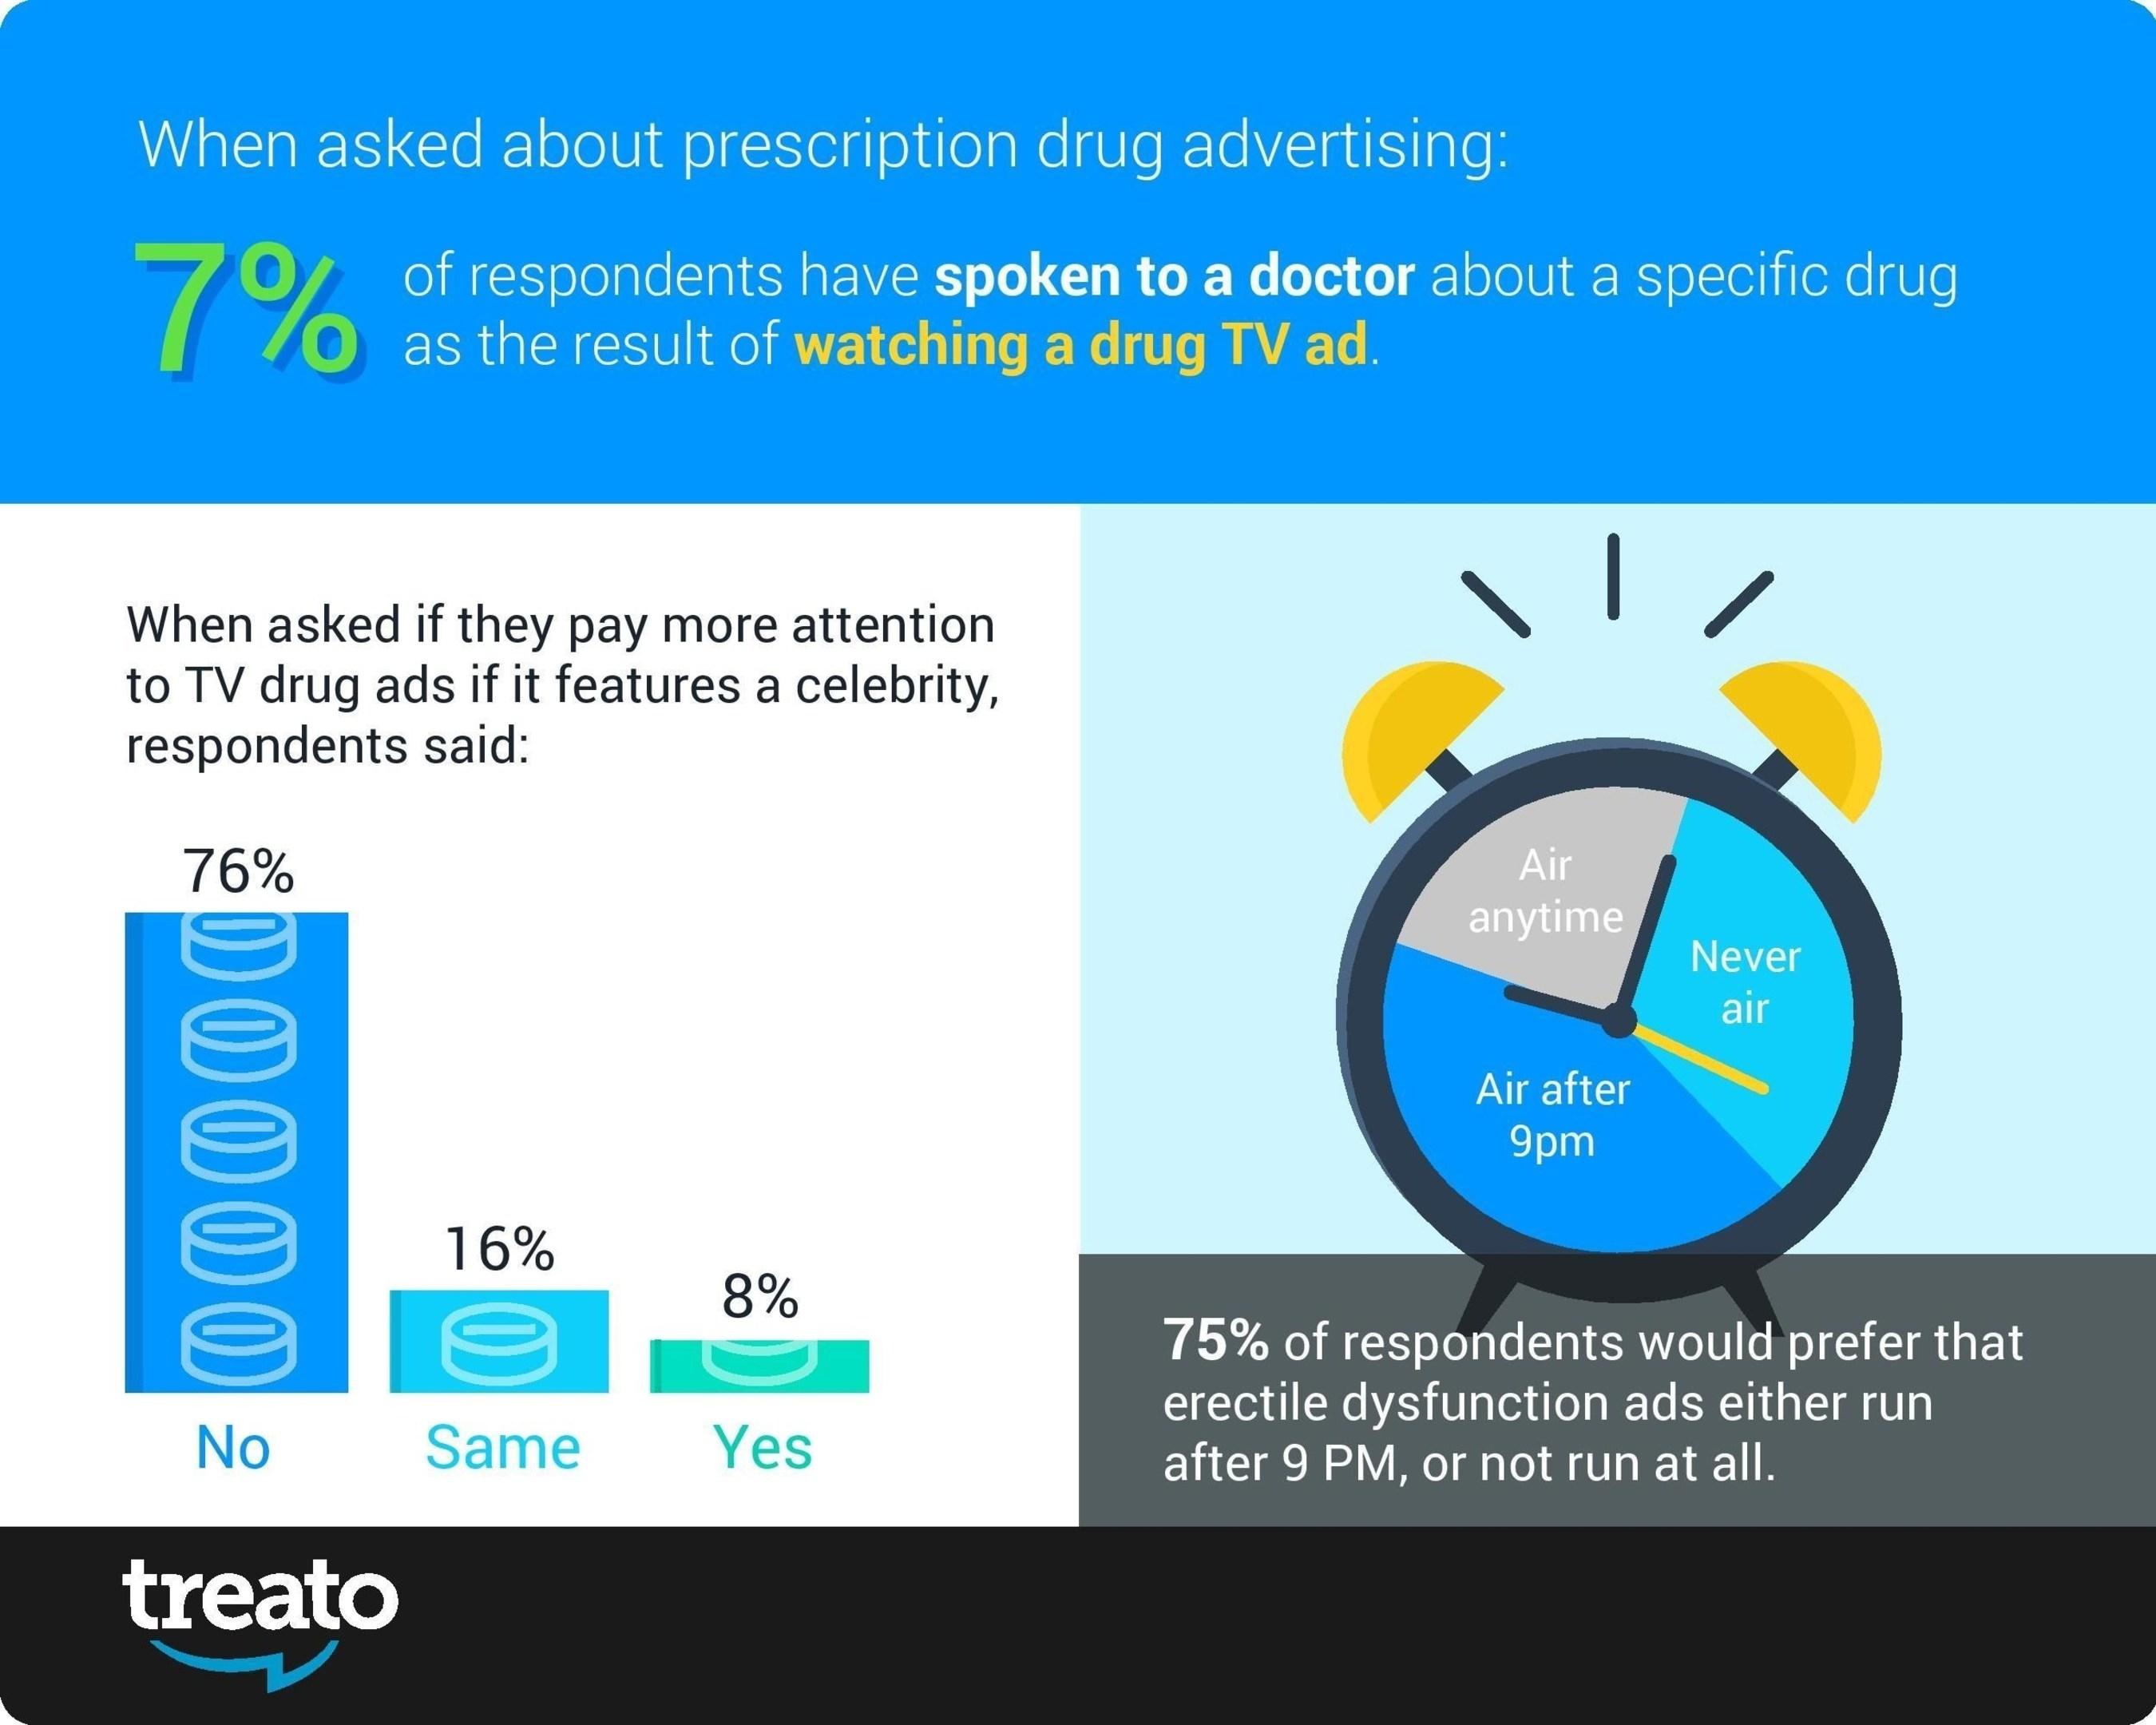 Treato's DTC Pharma Advertising Survey